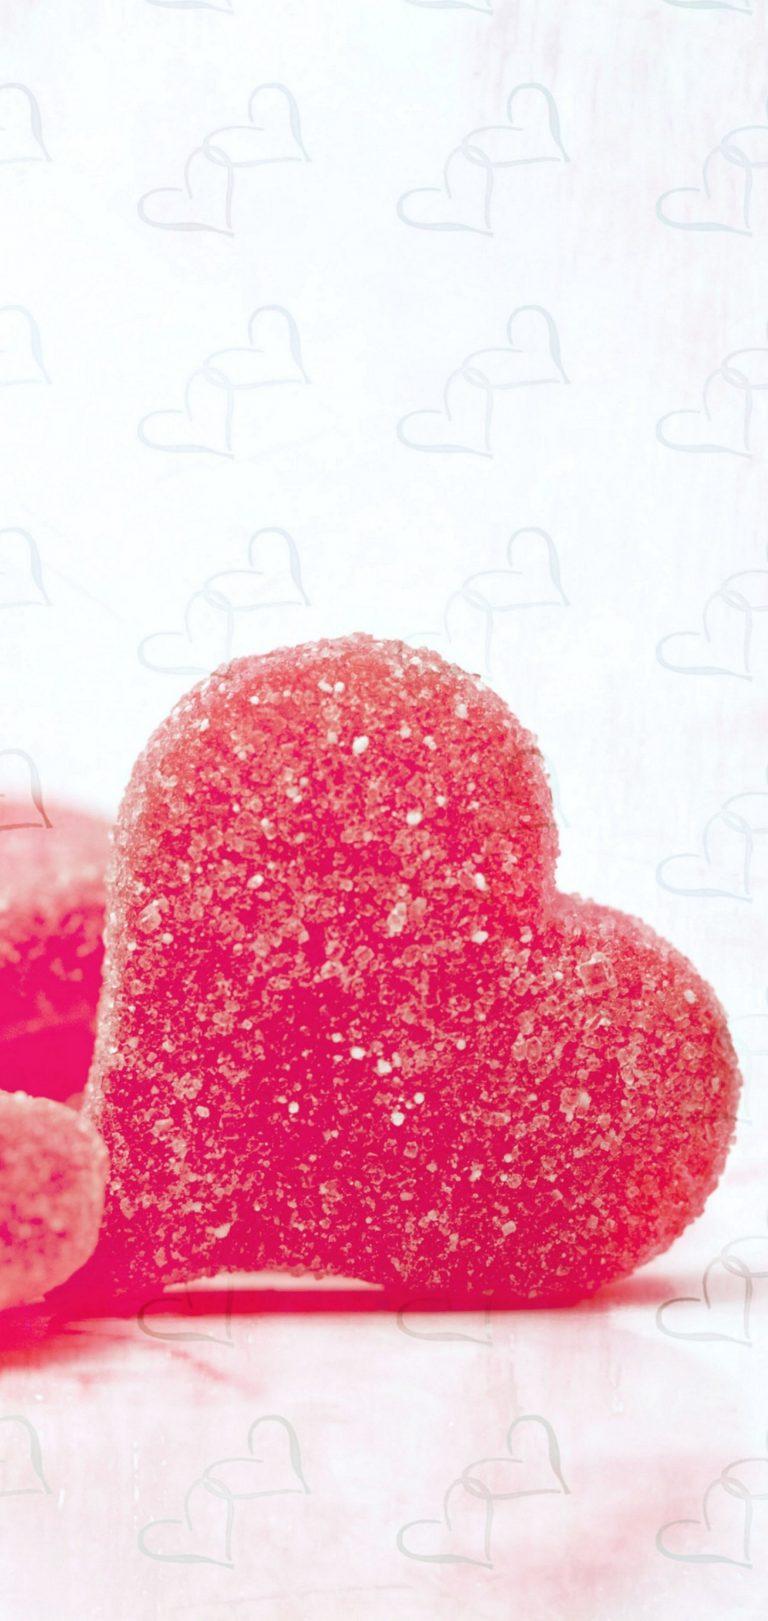 Hearts Candy Sugar Wallpaper 1440x3040 768x1621